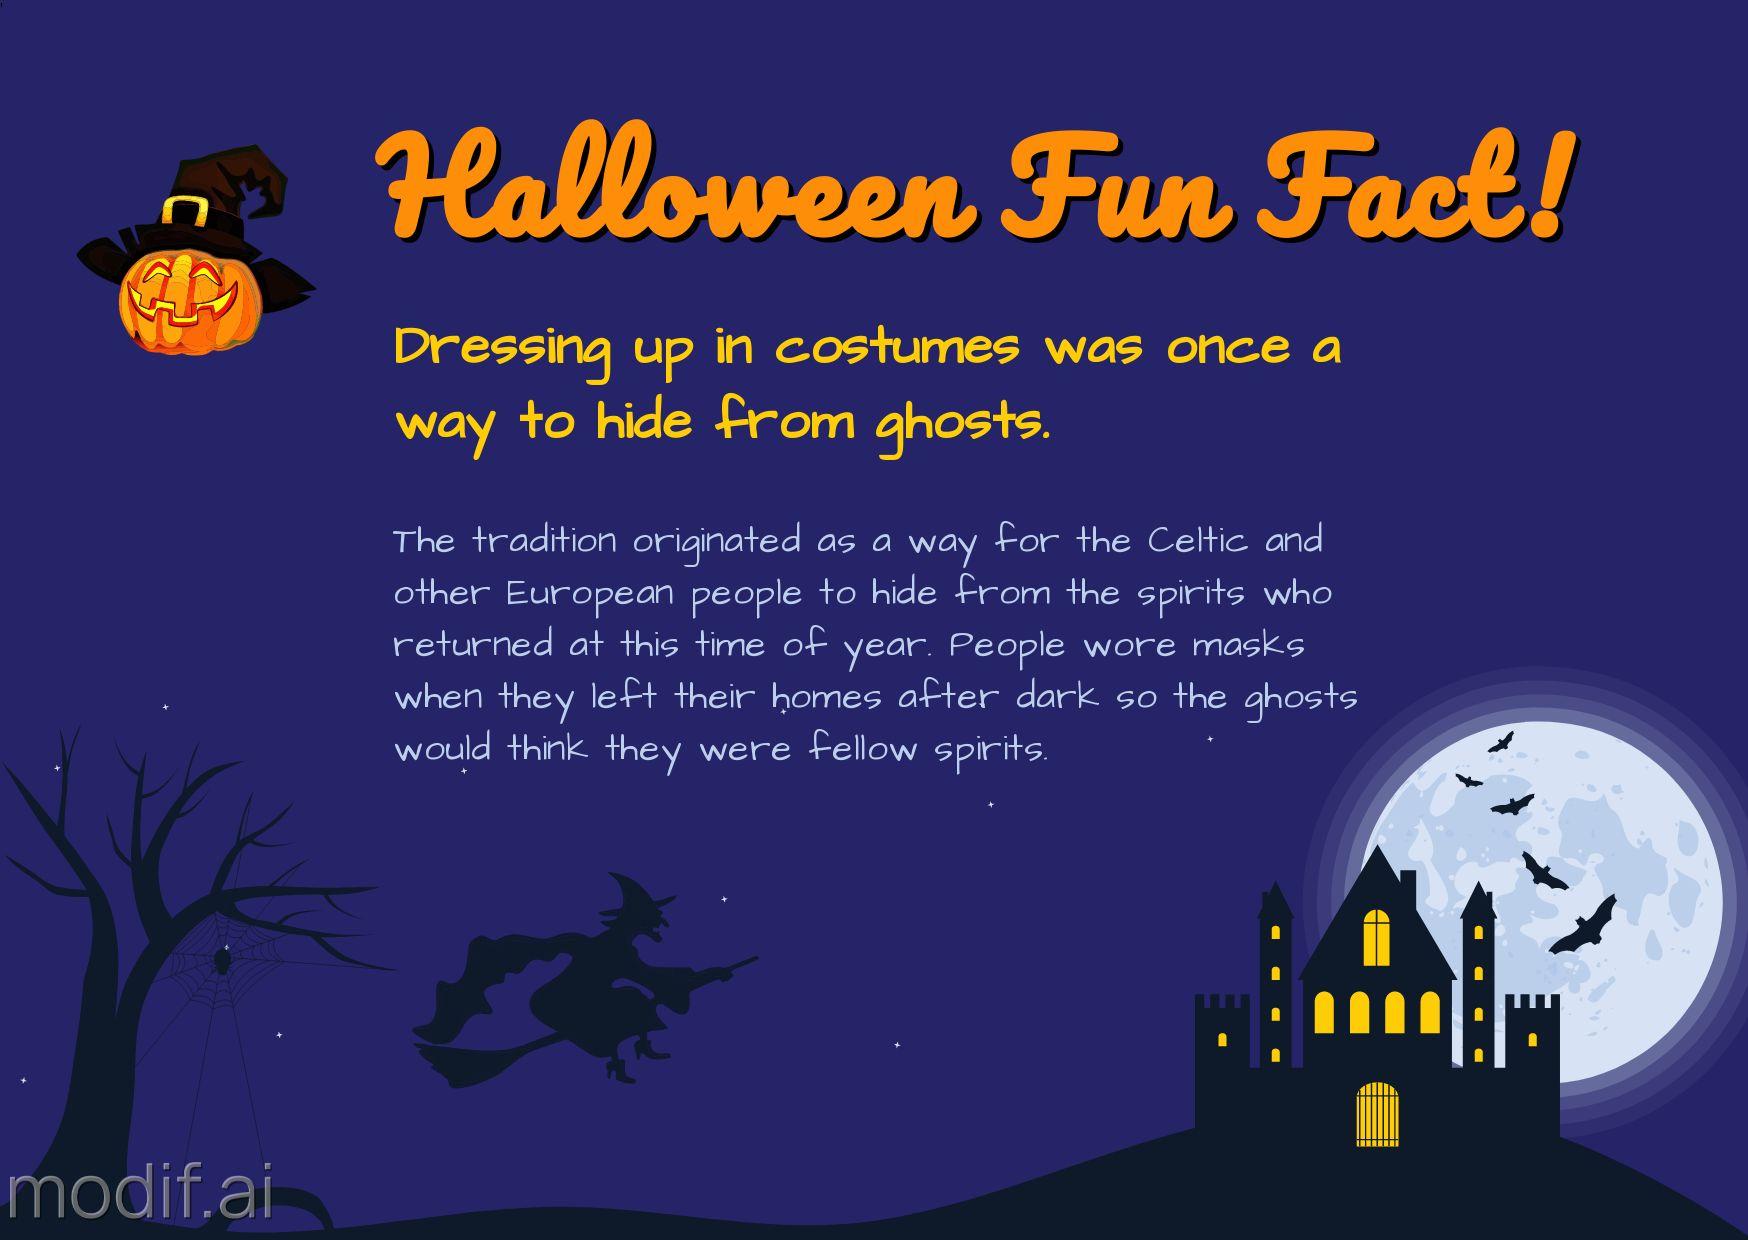 Halloween Fun Fact Template